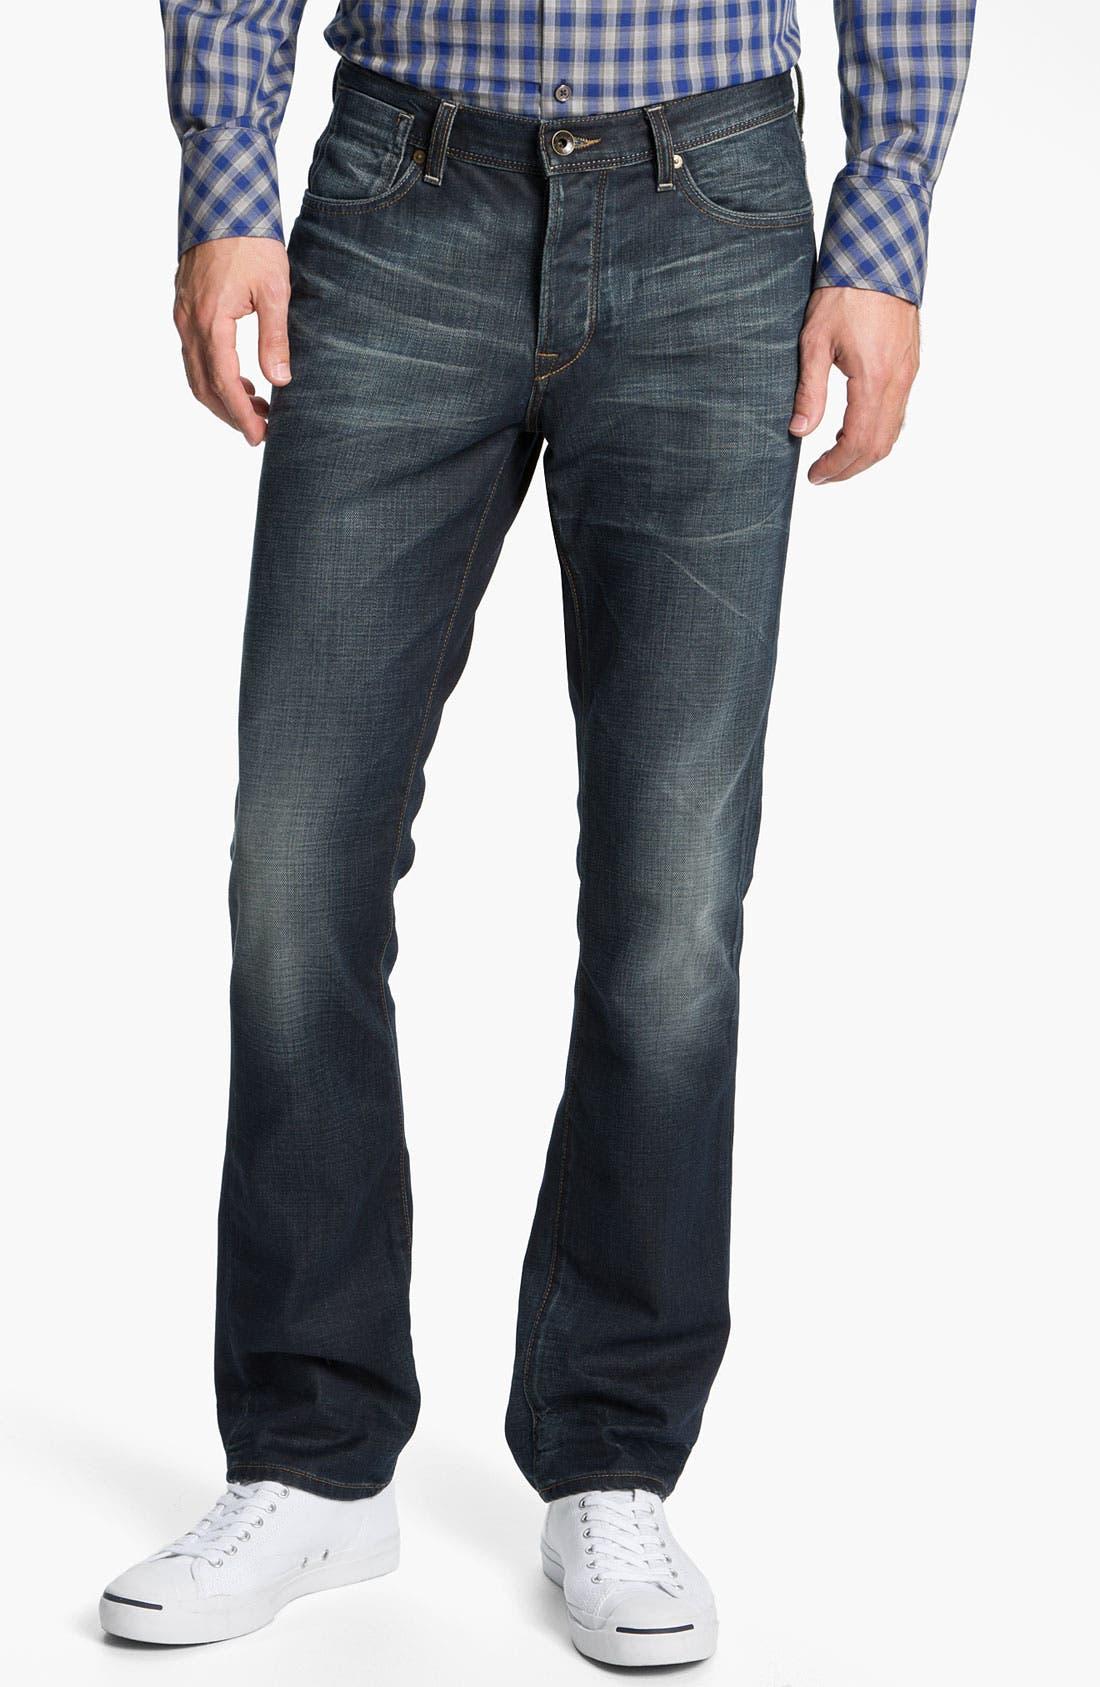 Main Image - John Varvatos 'Bowery' Slim Straight Leg Jeans (Dark Indigo)